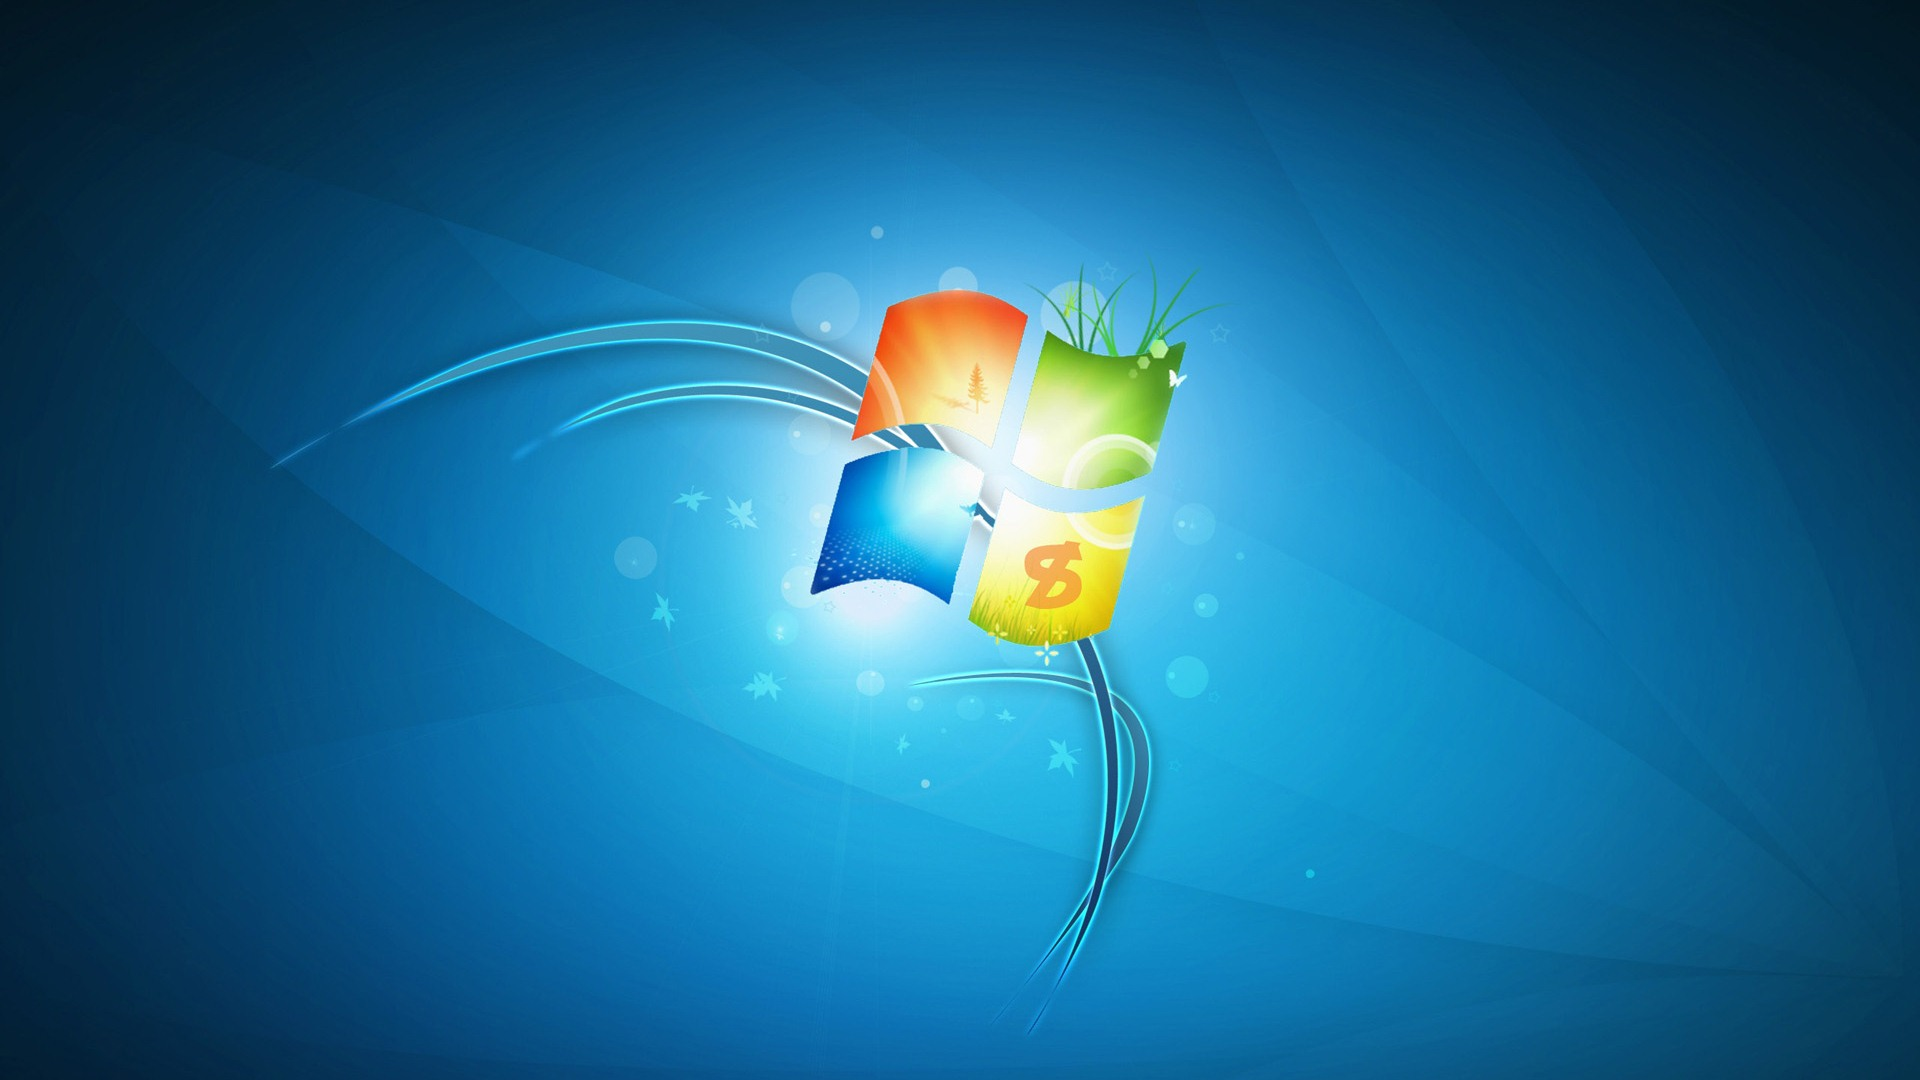 Windows 8 1 13 1920x1080 windows 8 for 13 window